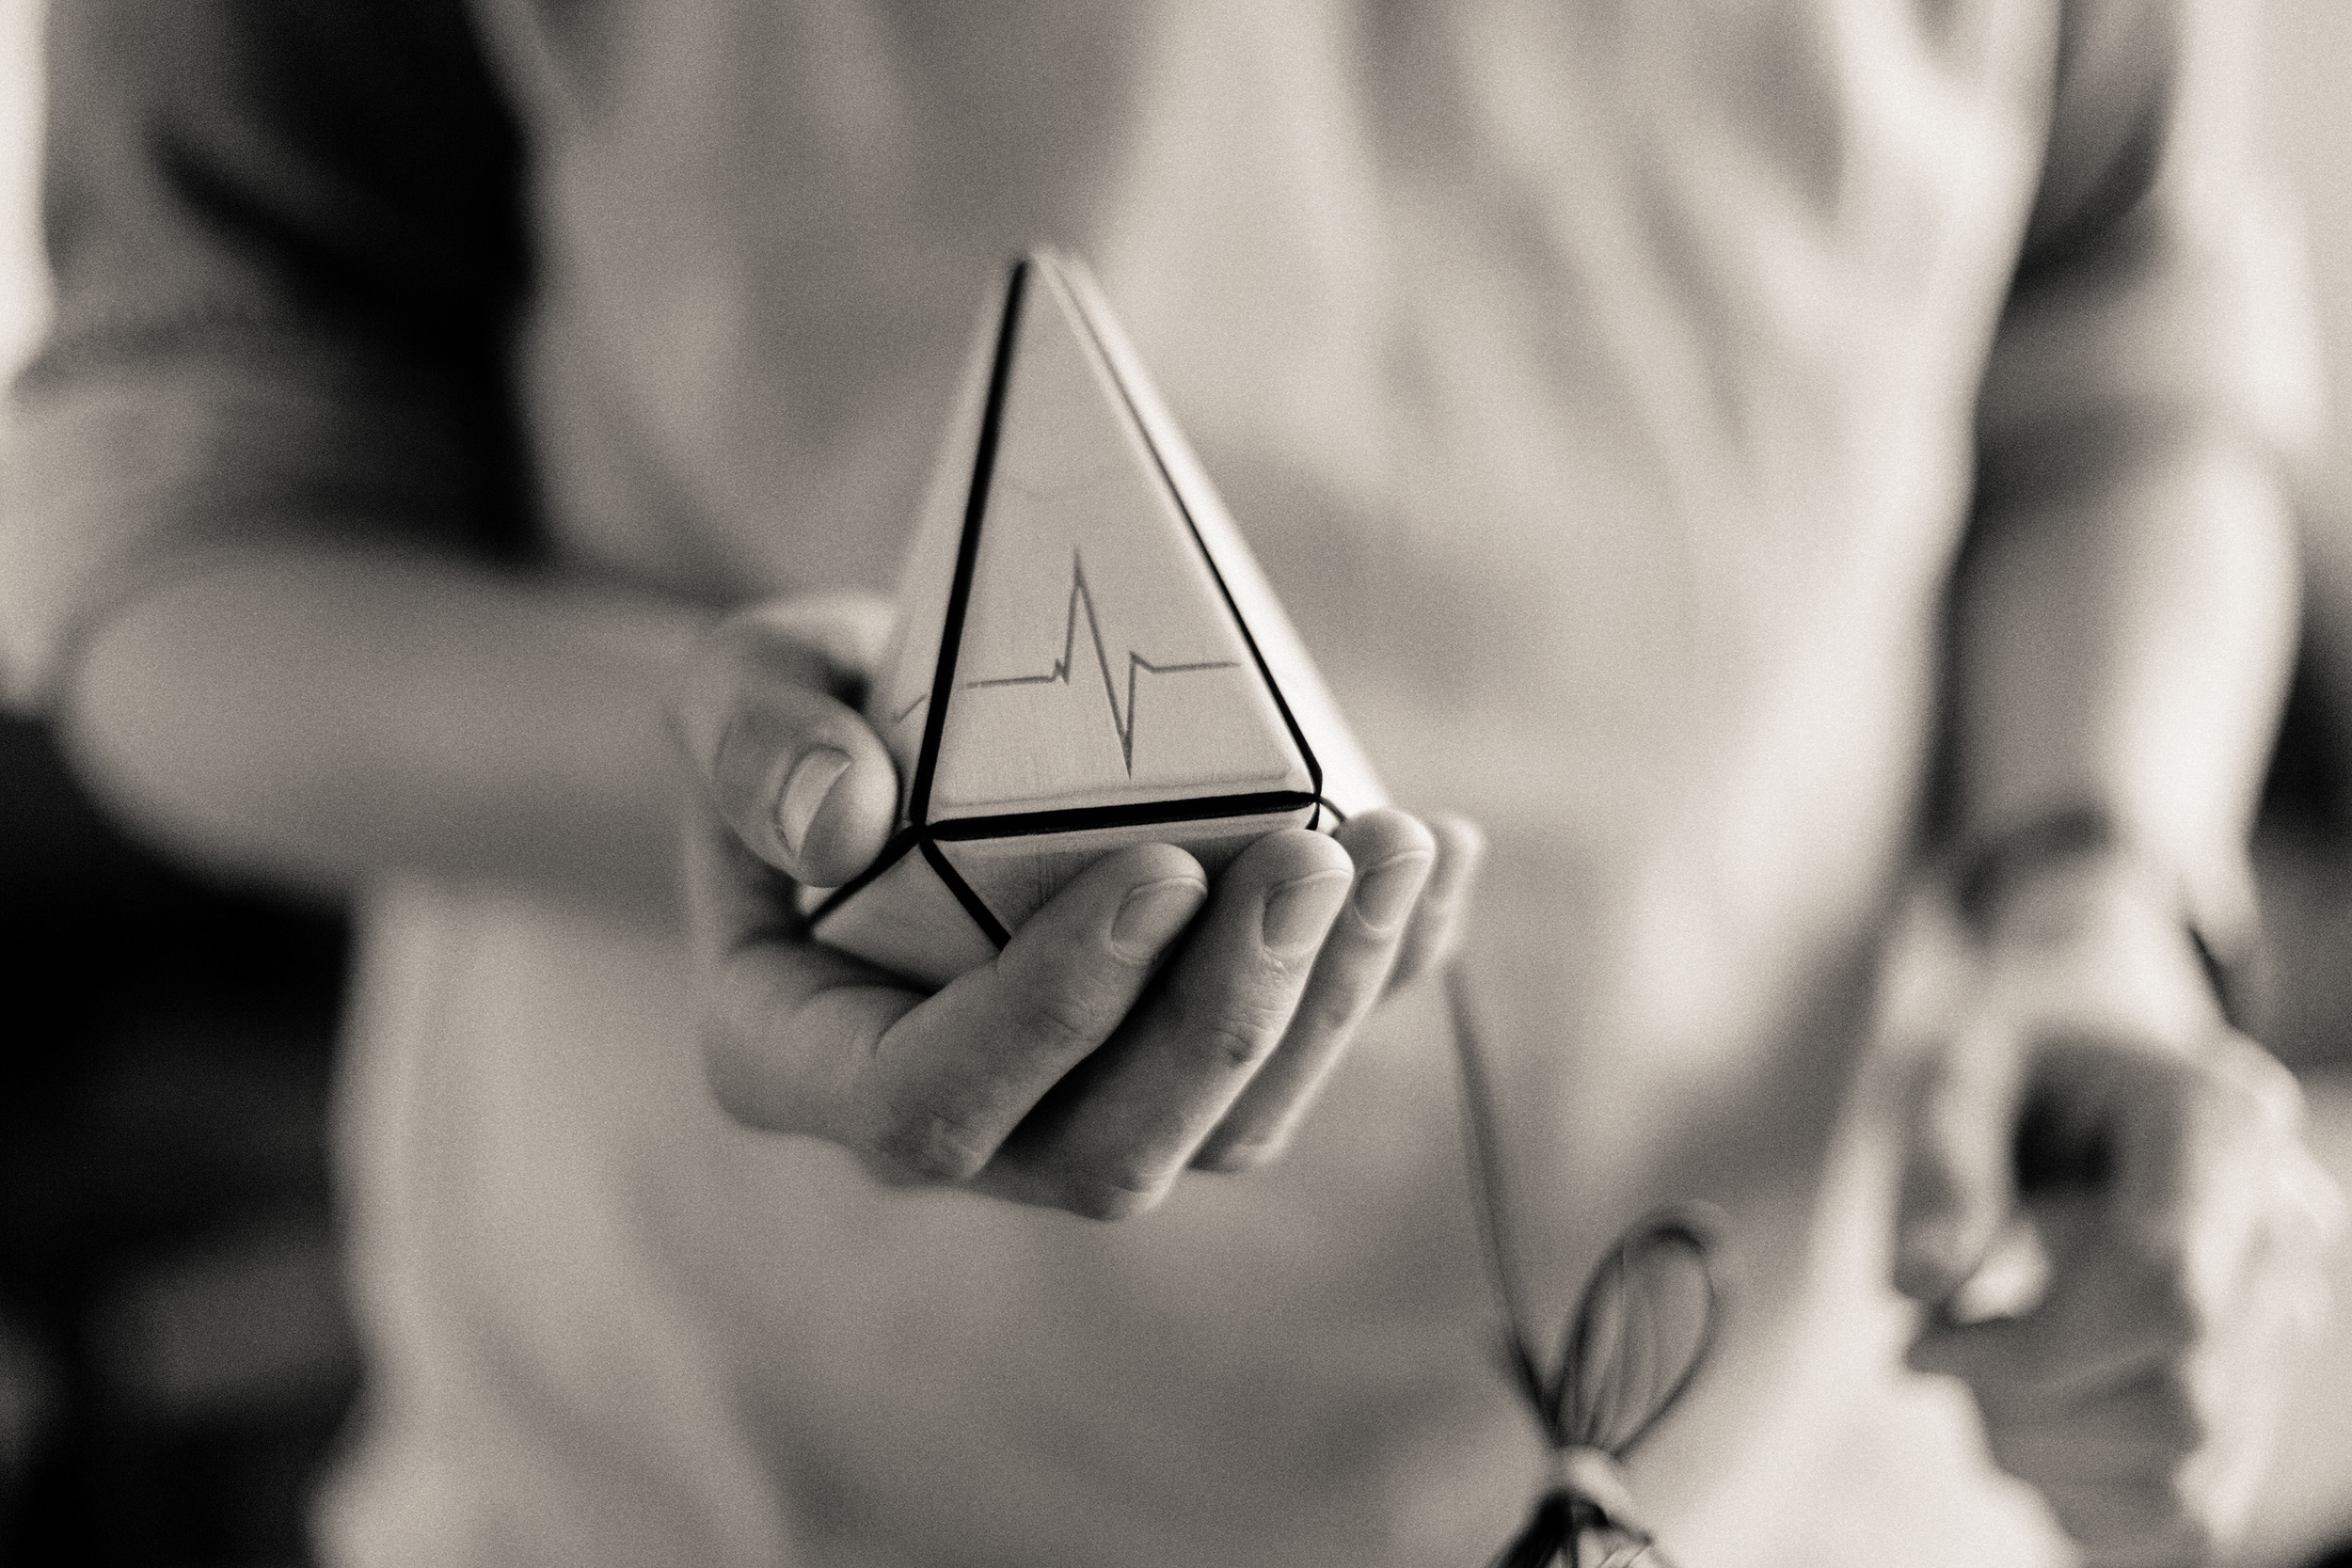 A prototype 'heart' device